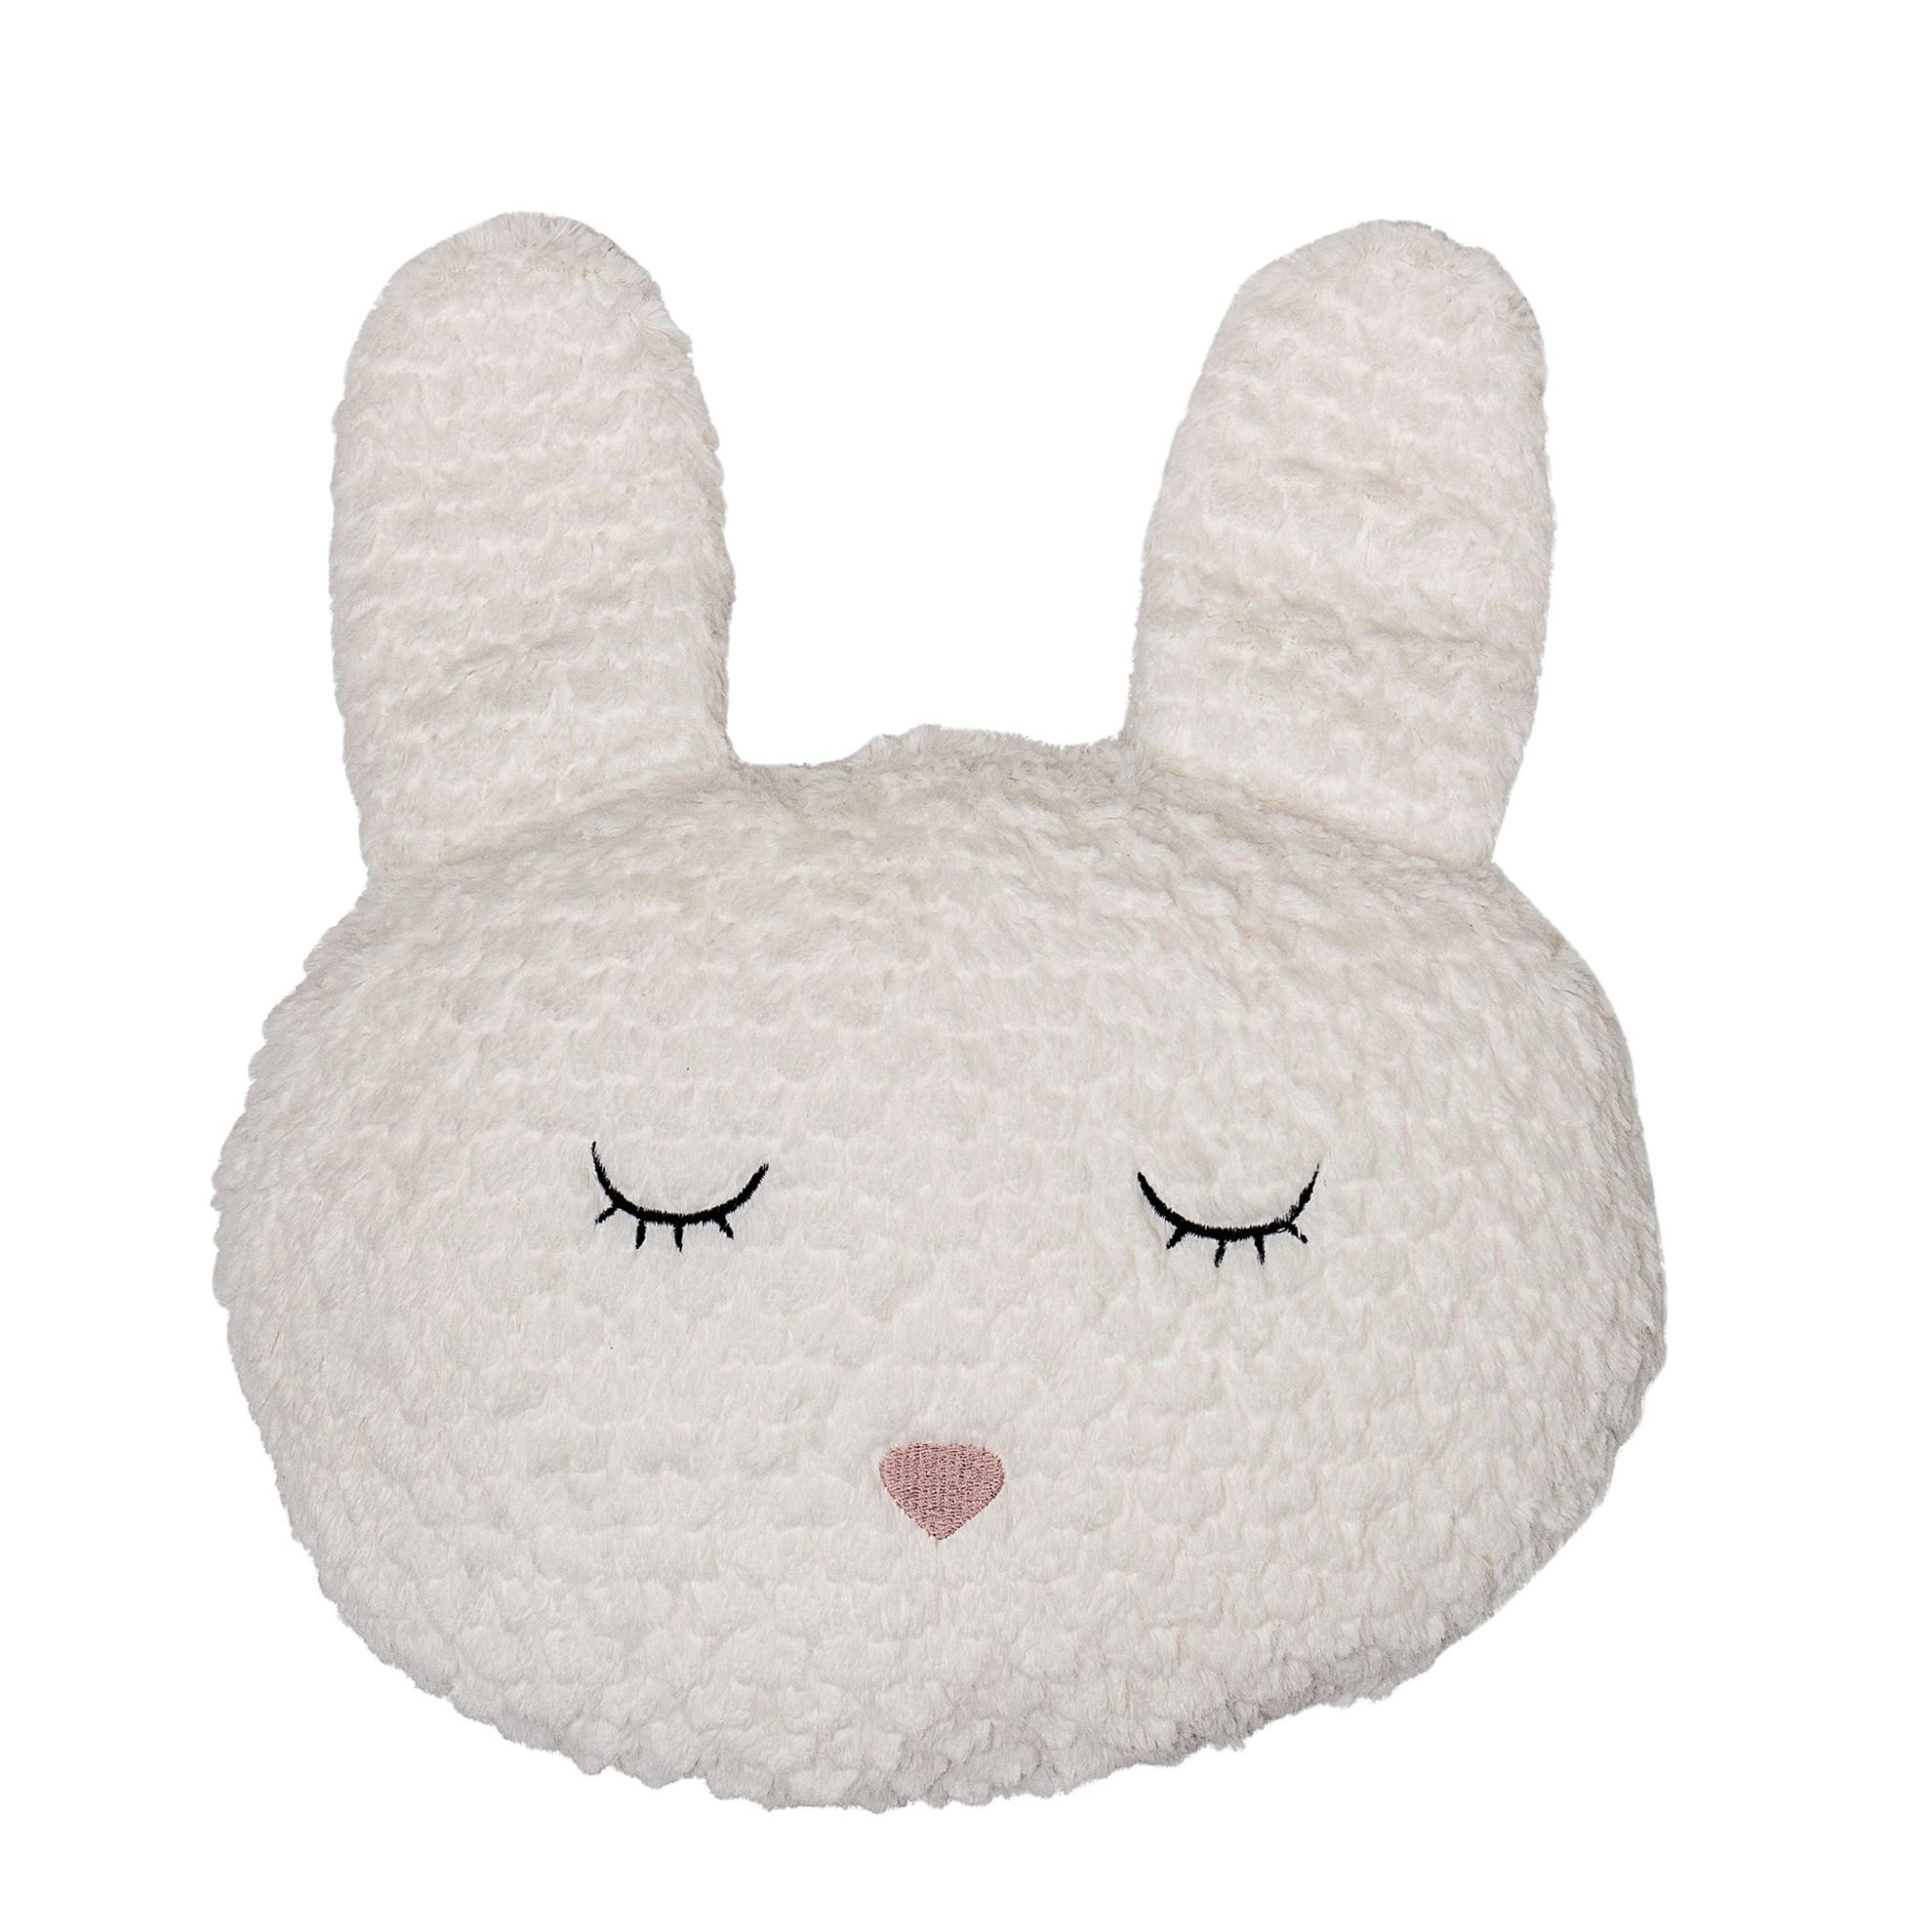 Chumlavý polštář Rabbit_2